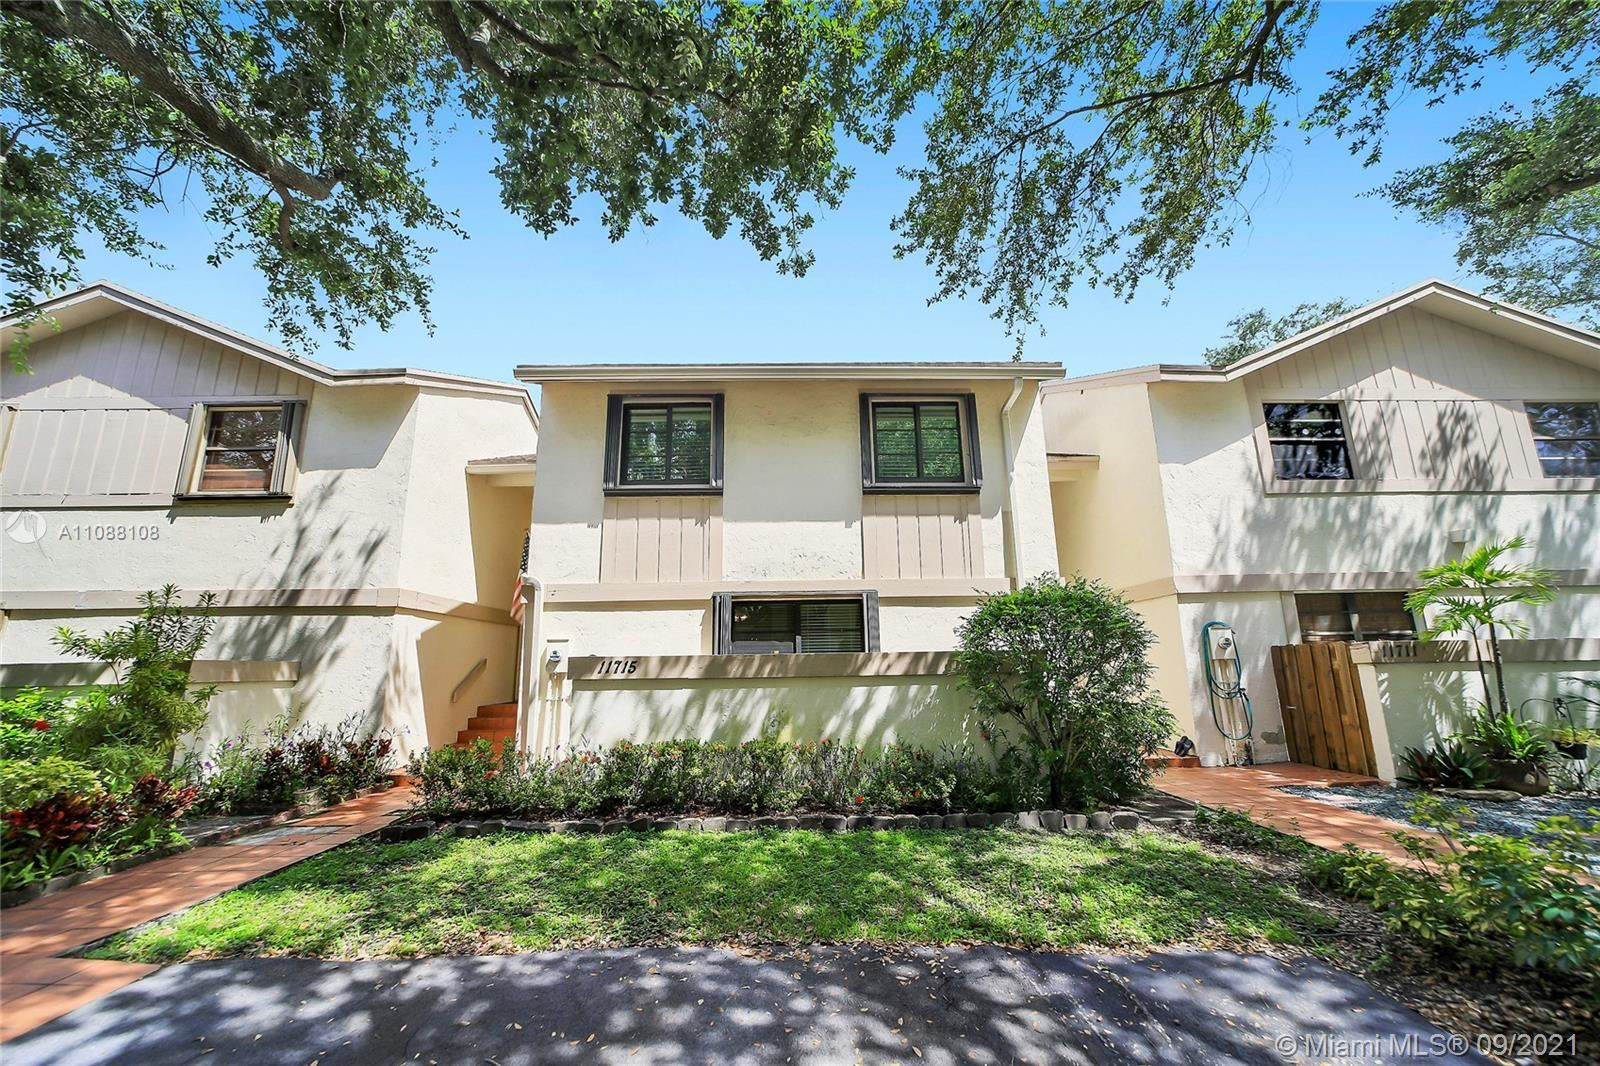 11715 SW 92nd Terrace, Miami, FL 33186 - #: A11088108